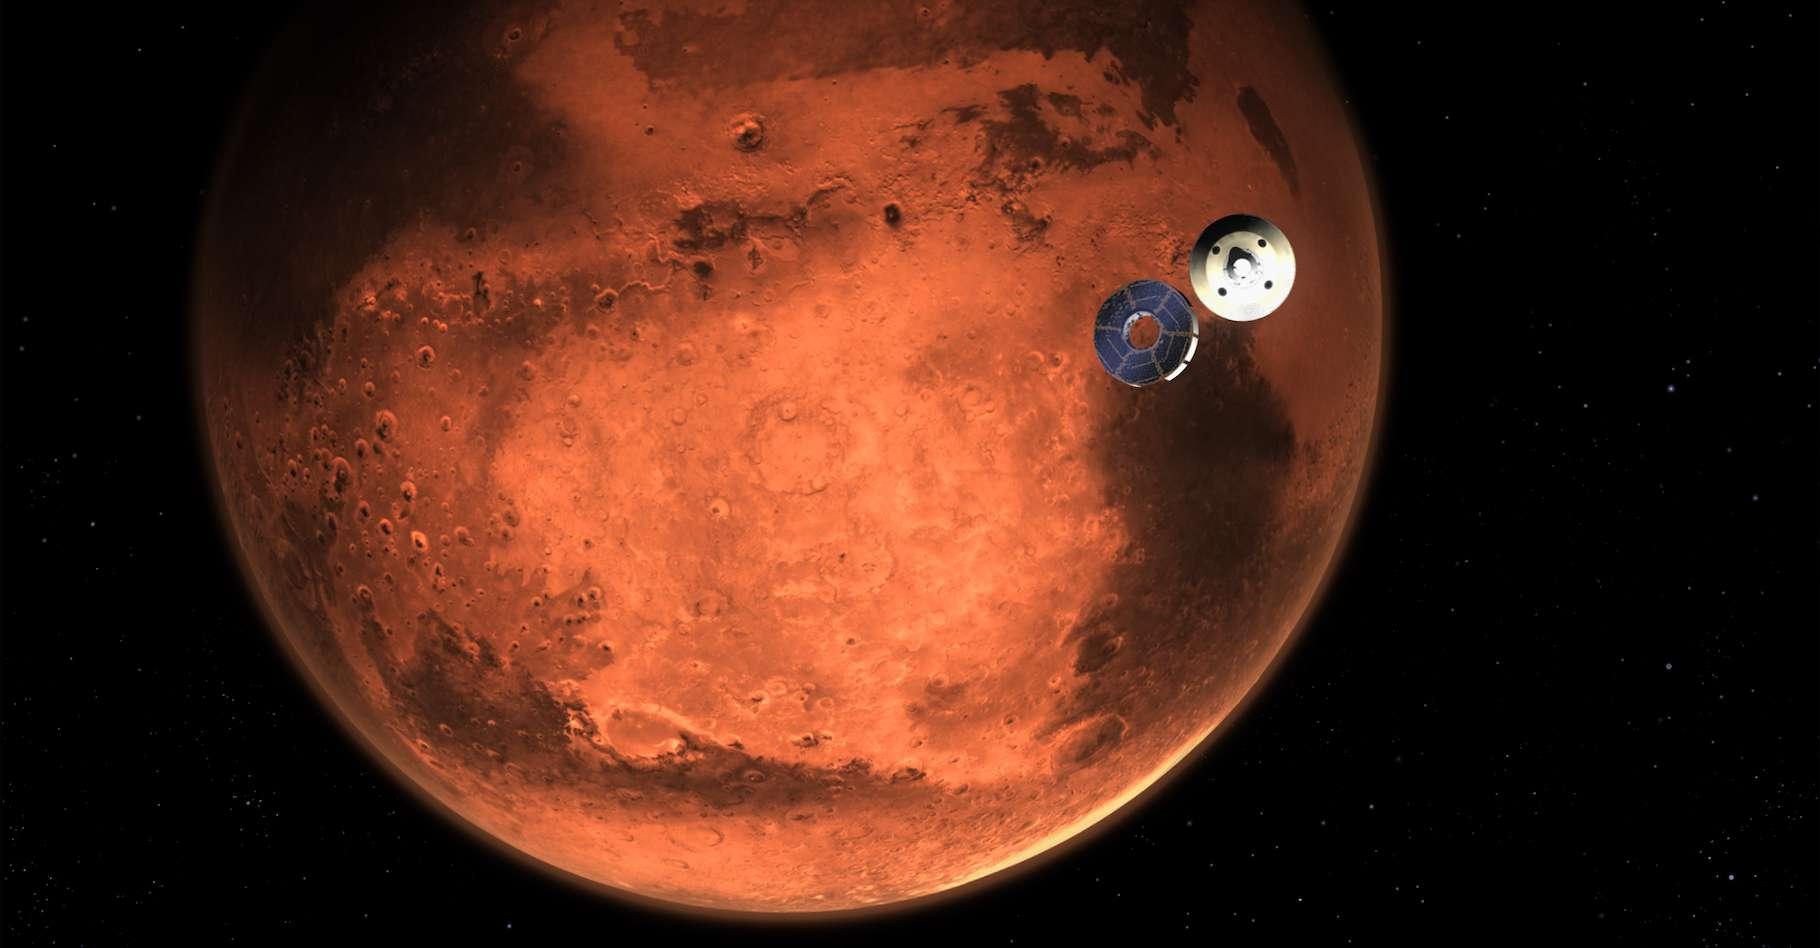 Perseverance arrive sur Mars ! © Nasa, JPL-Caltech